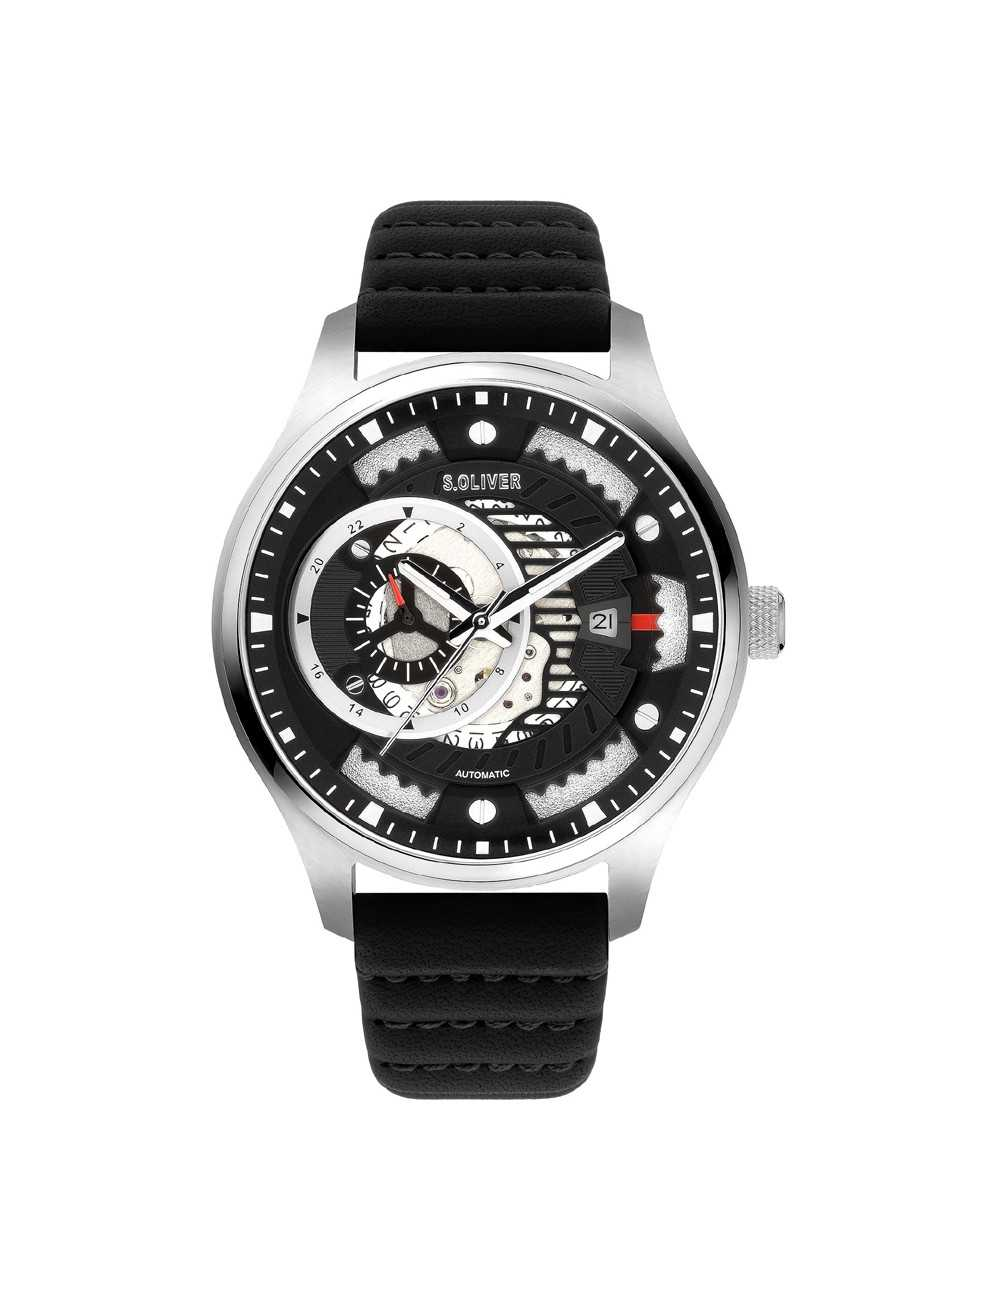 s.Oliver SO-3941-LA Mens Watch